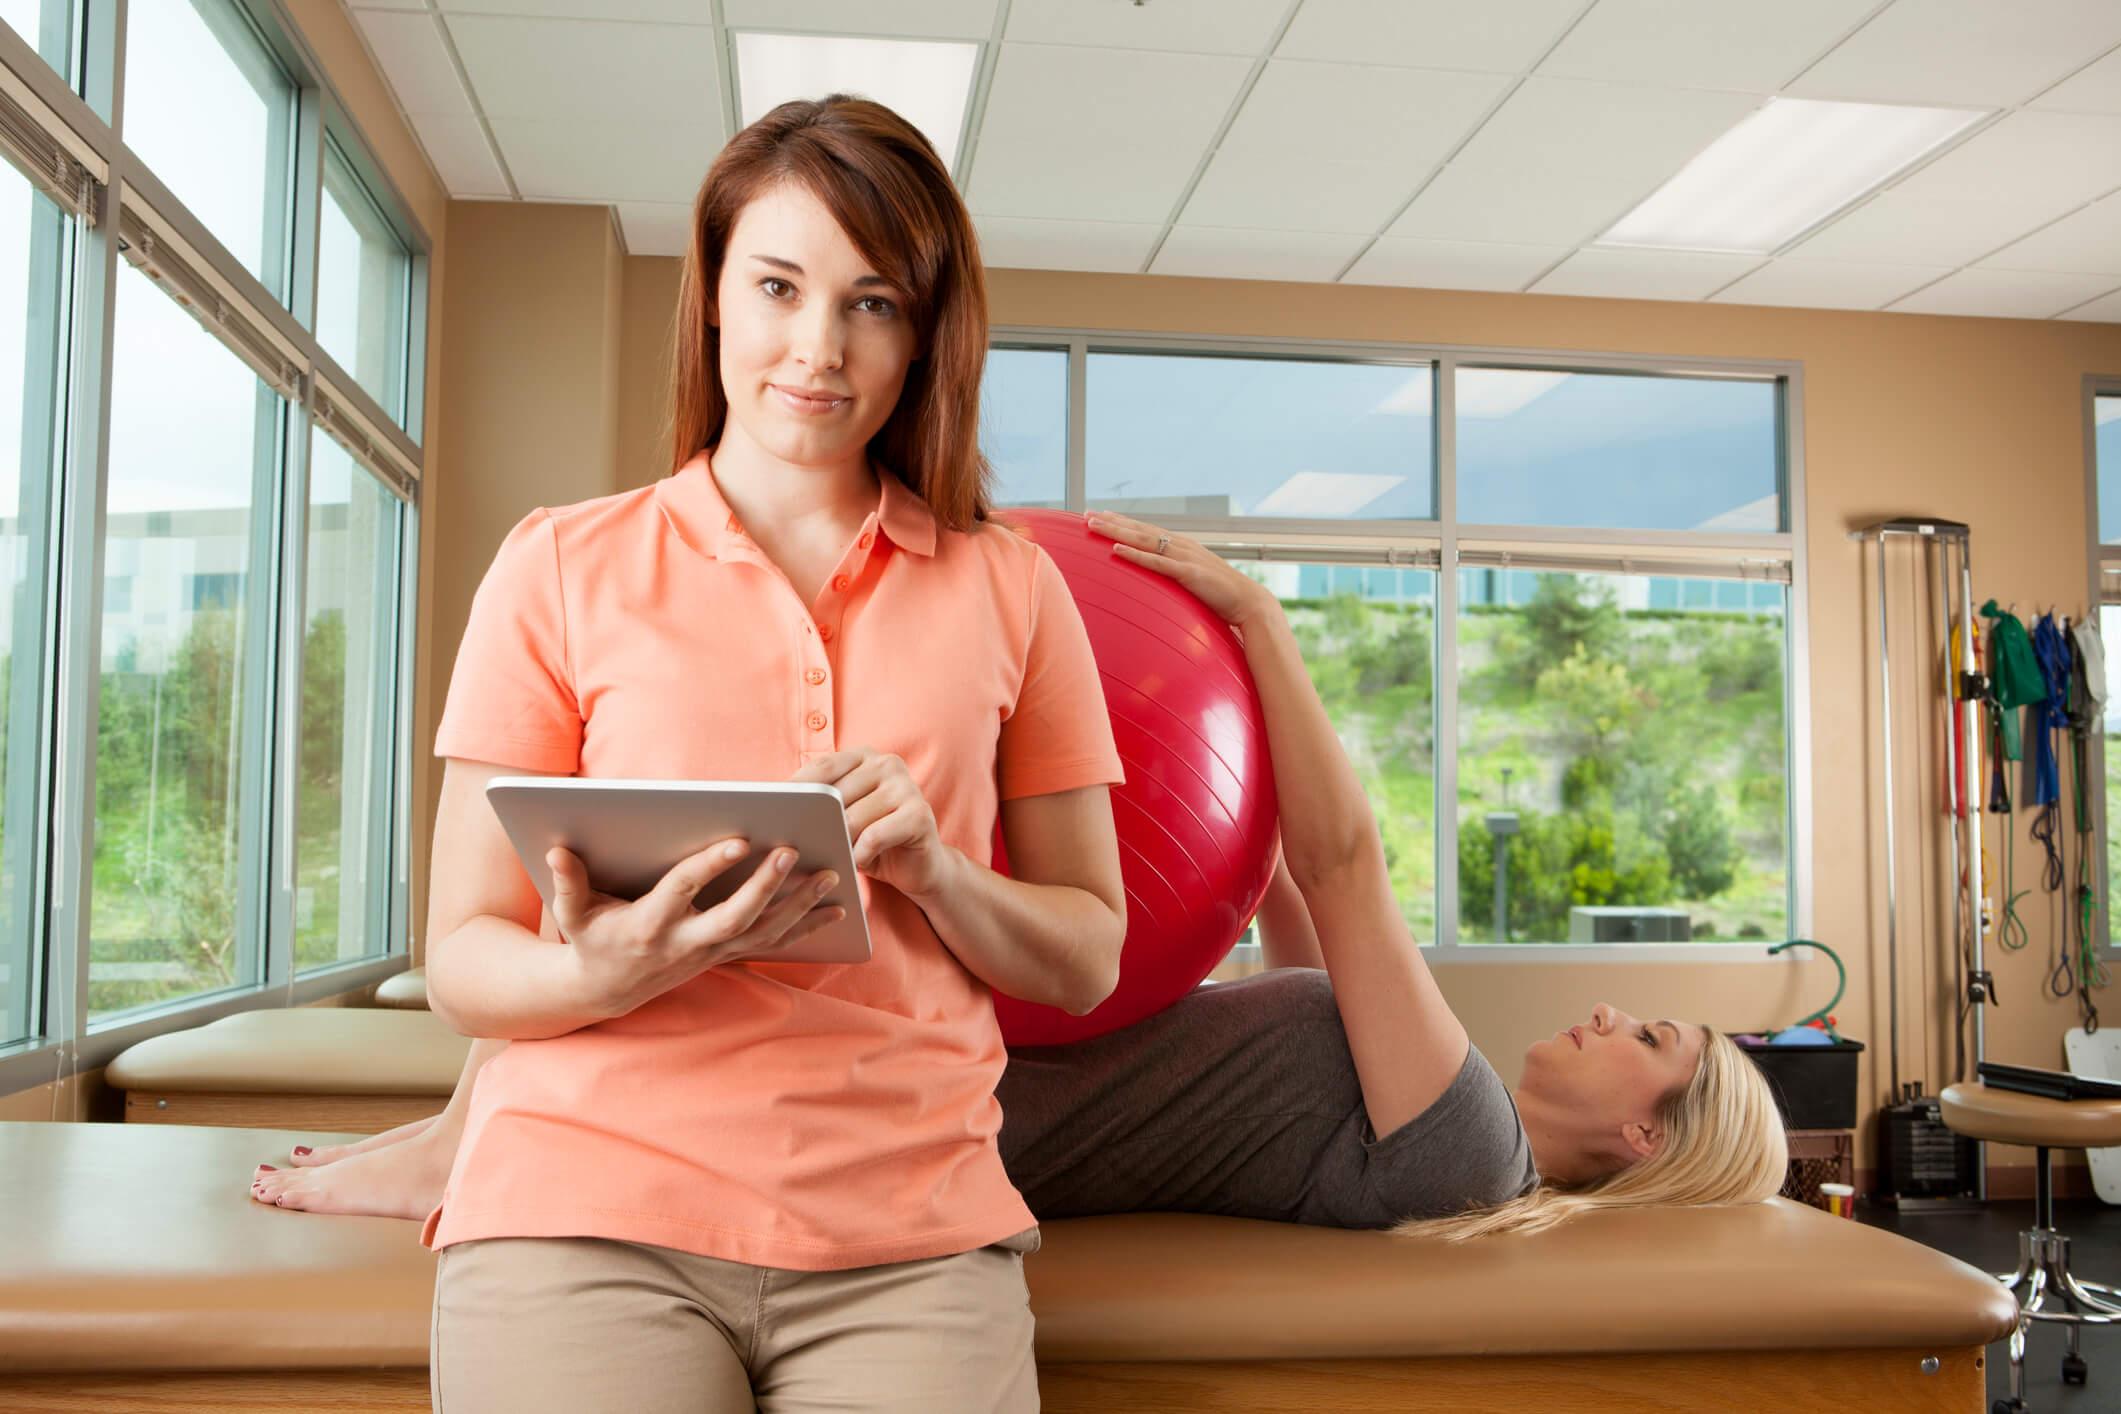 Importância da evolução tecnológica na fisioterapia pélvica